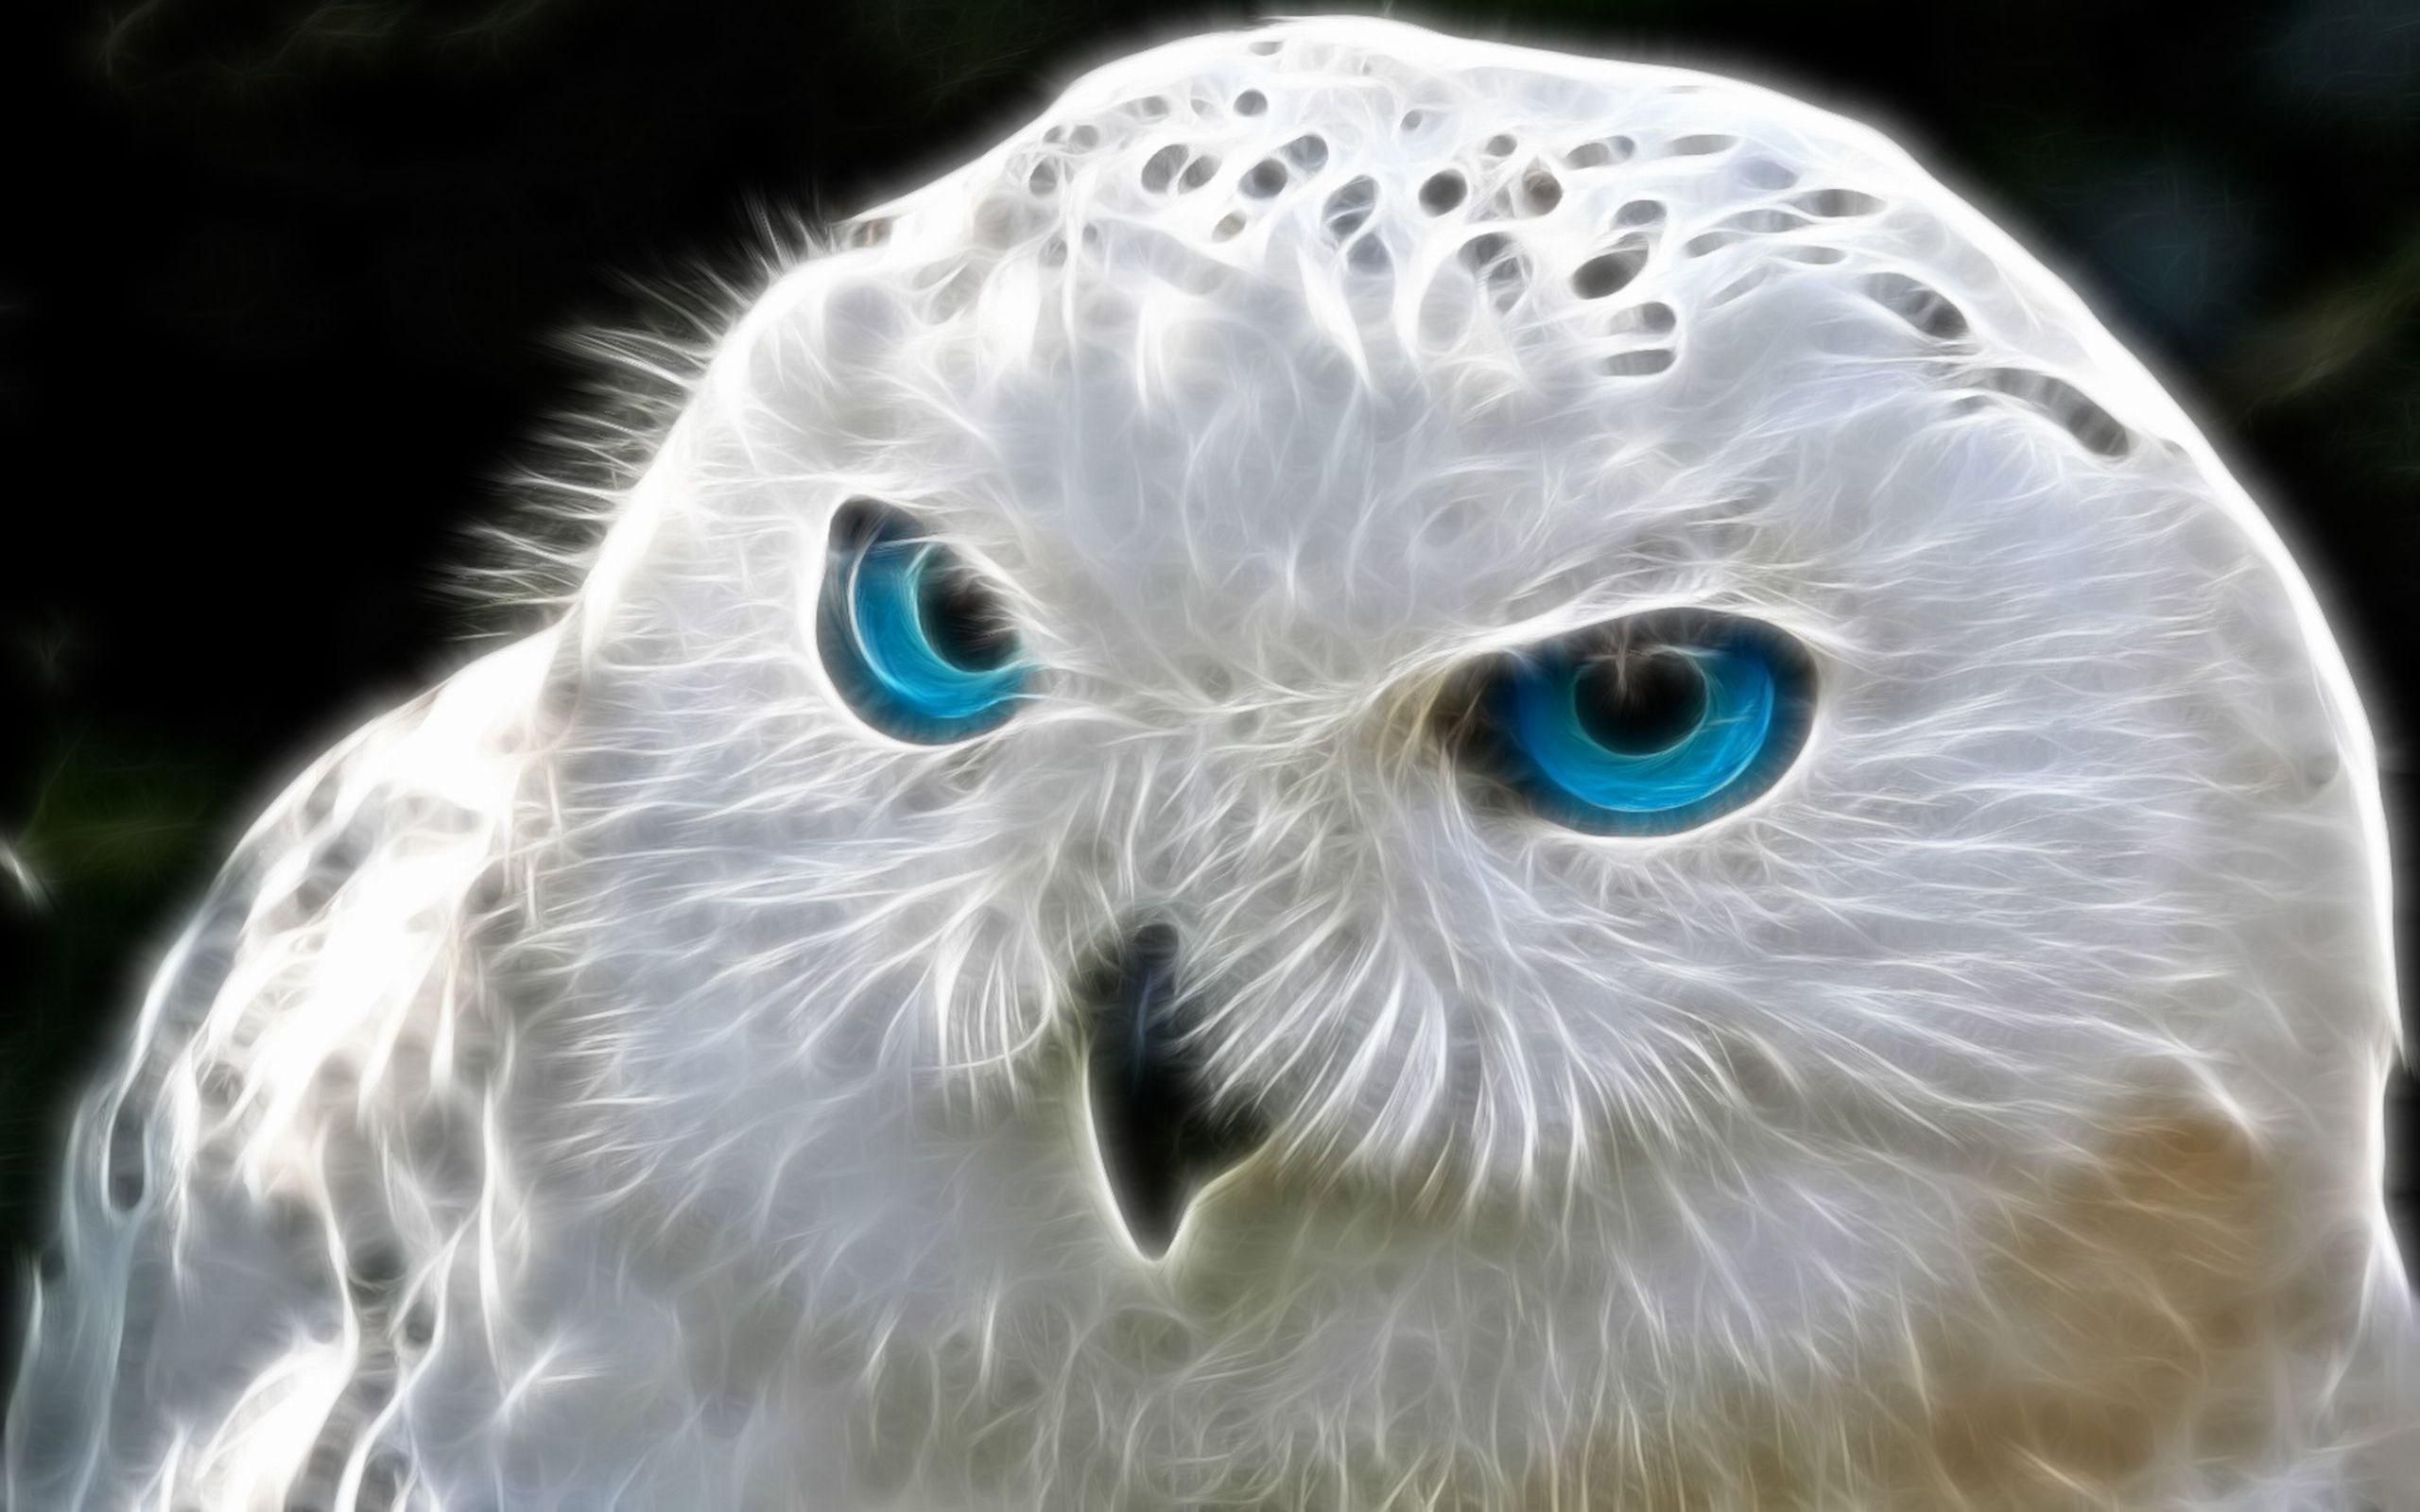 Digital Art Eye Owl White 2560x1600